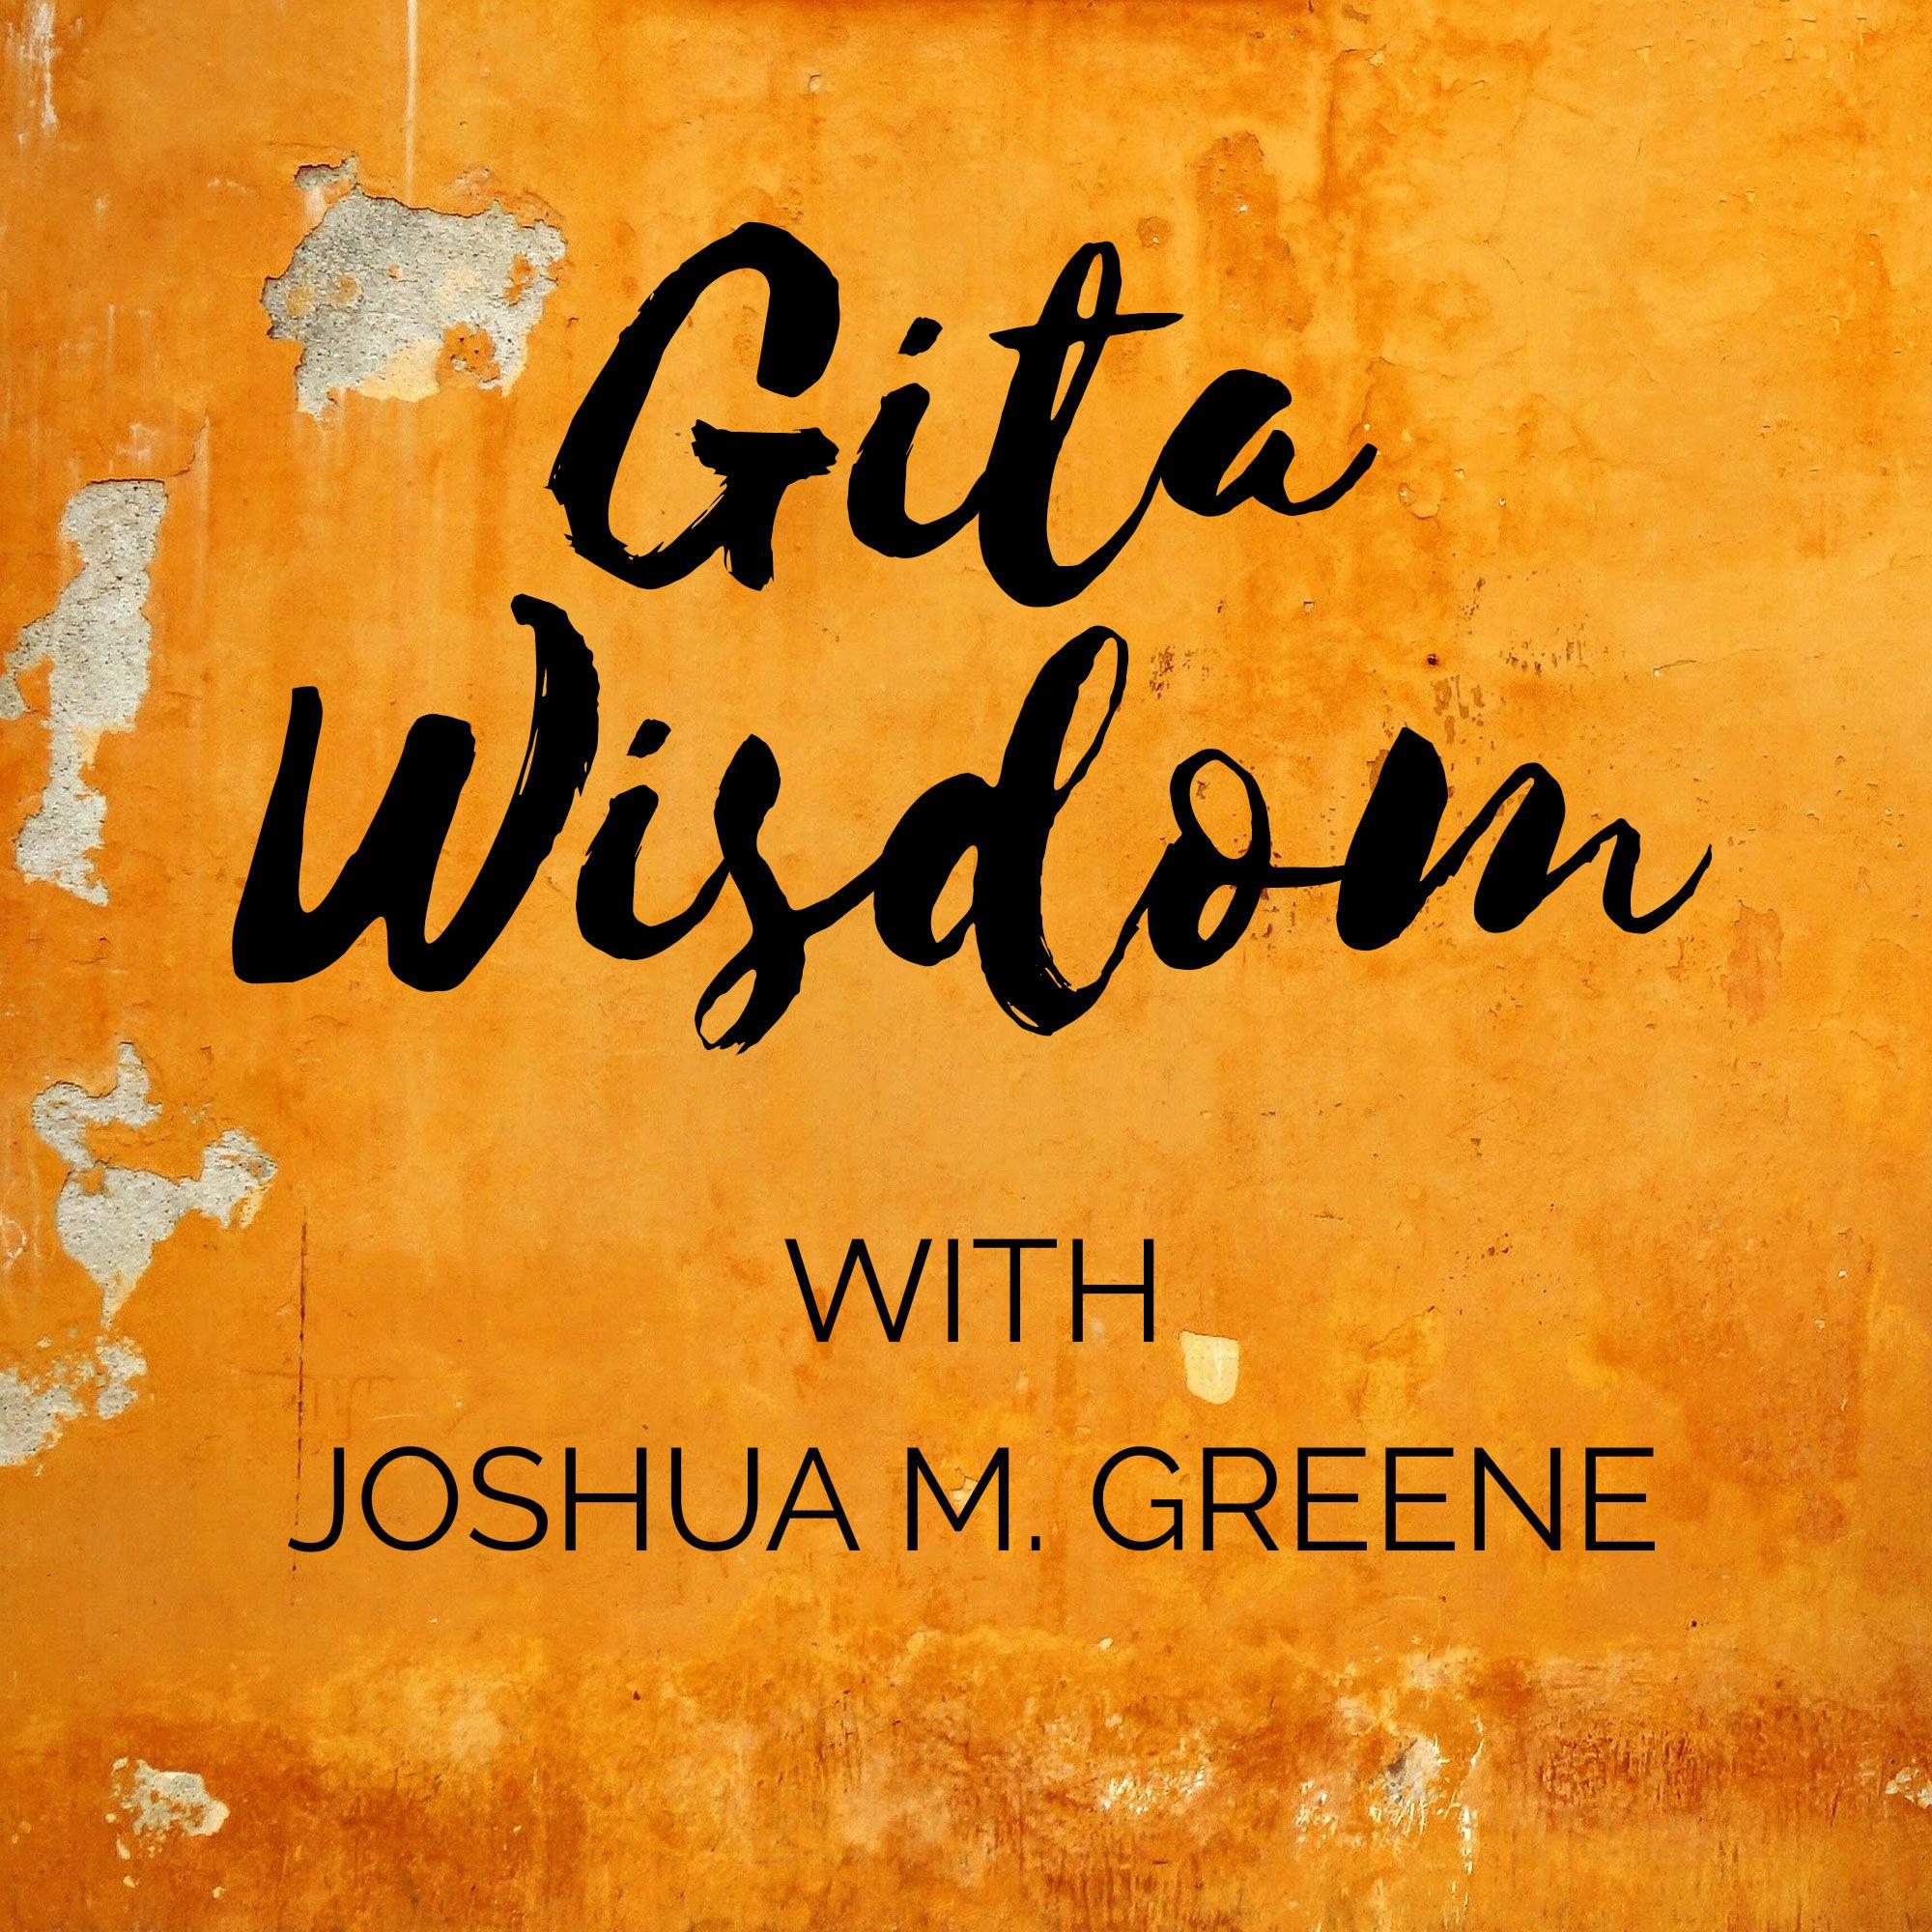 Gita Wisdom Teachings by Joshua M. Greene (Yogesvara)